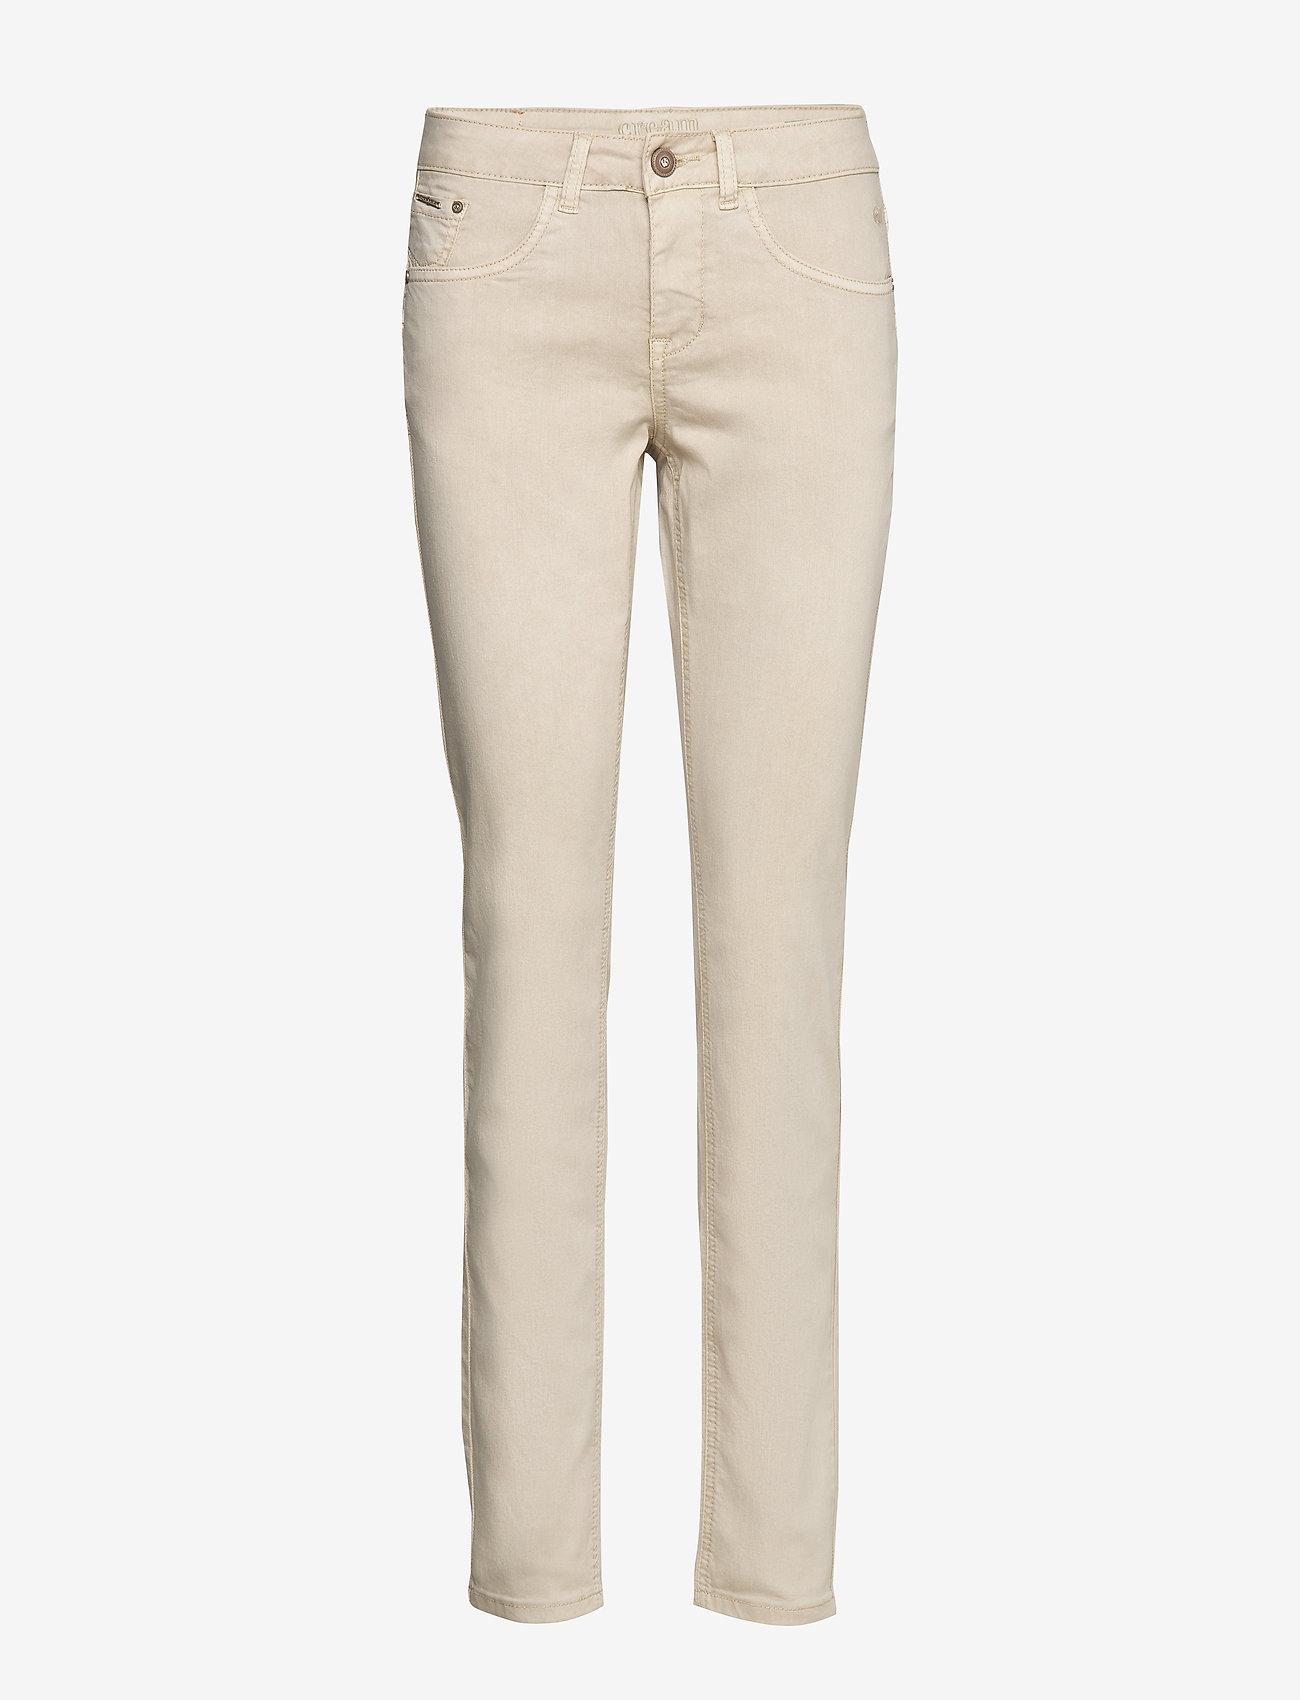 Cream - LotteCR Plain Twill - Coco Fit - skinny jeans - birch - 0